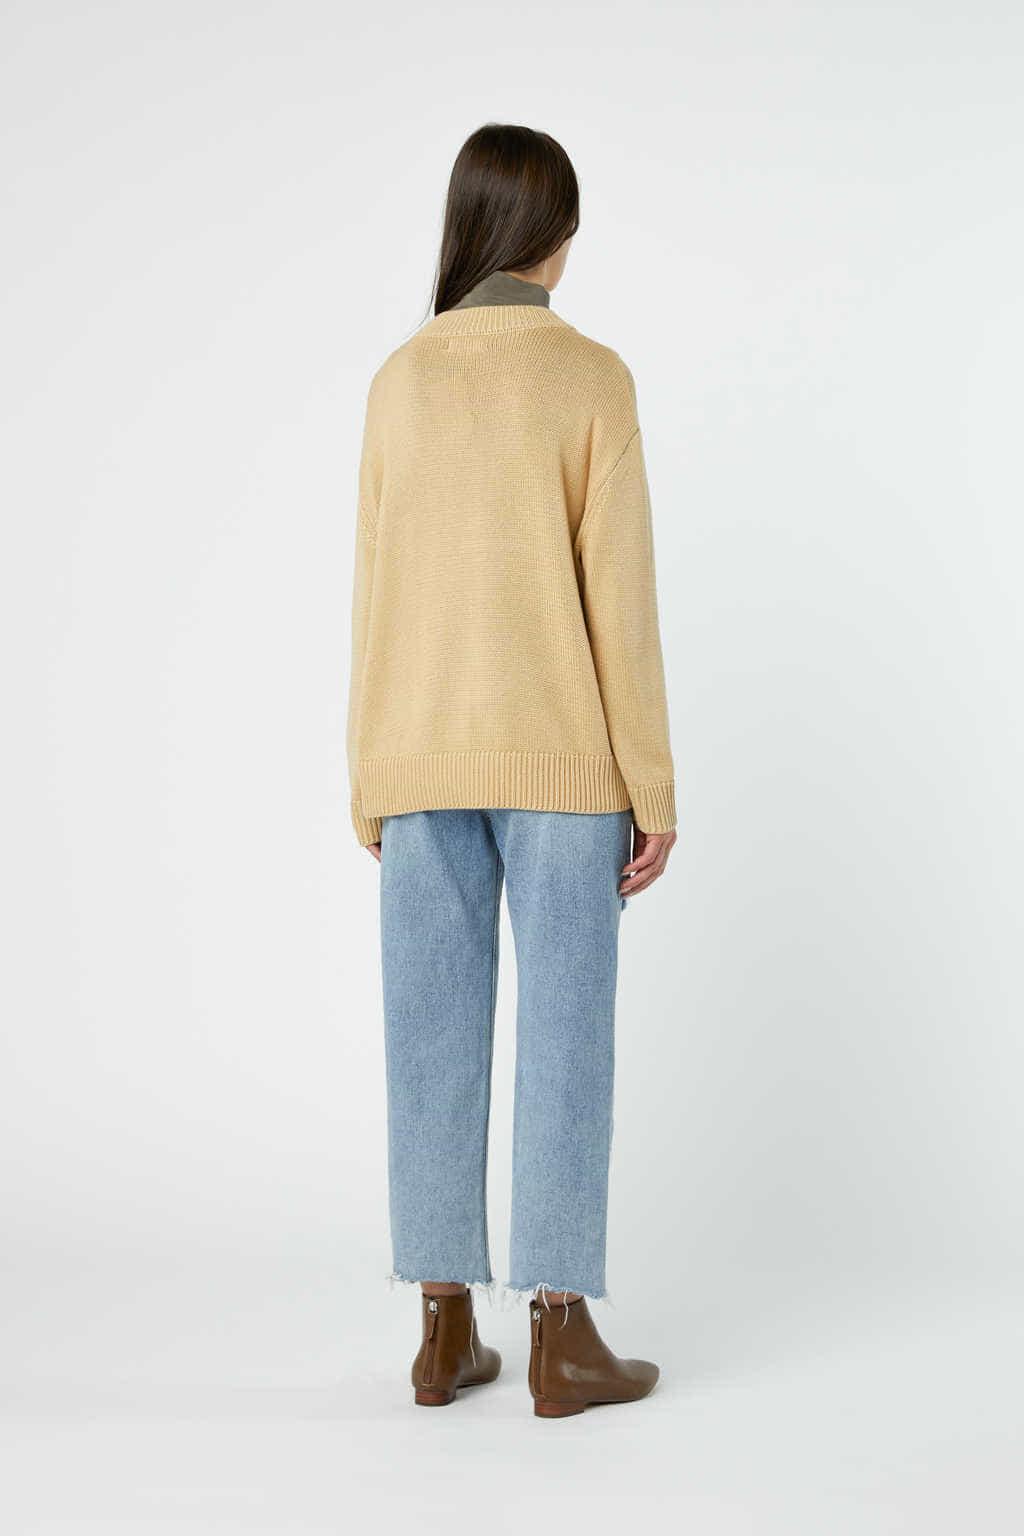 Sweater 3322 Cream 4